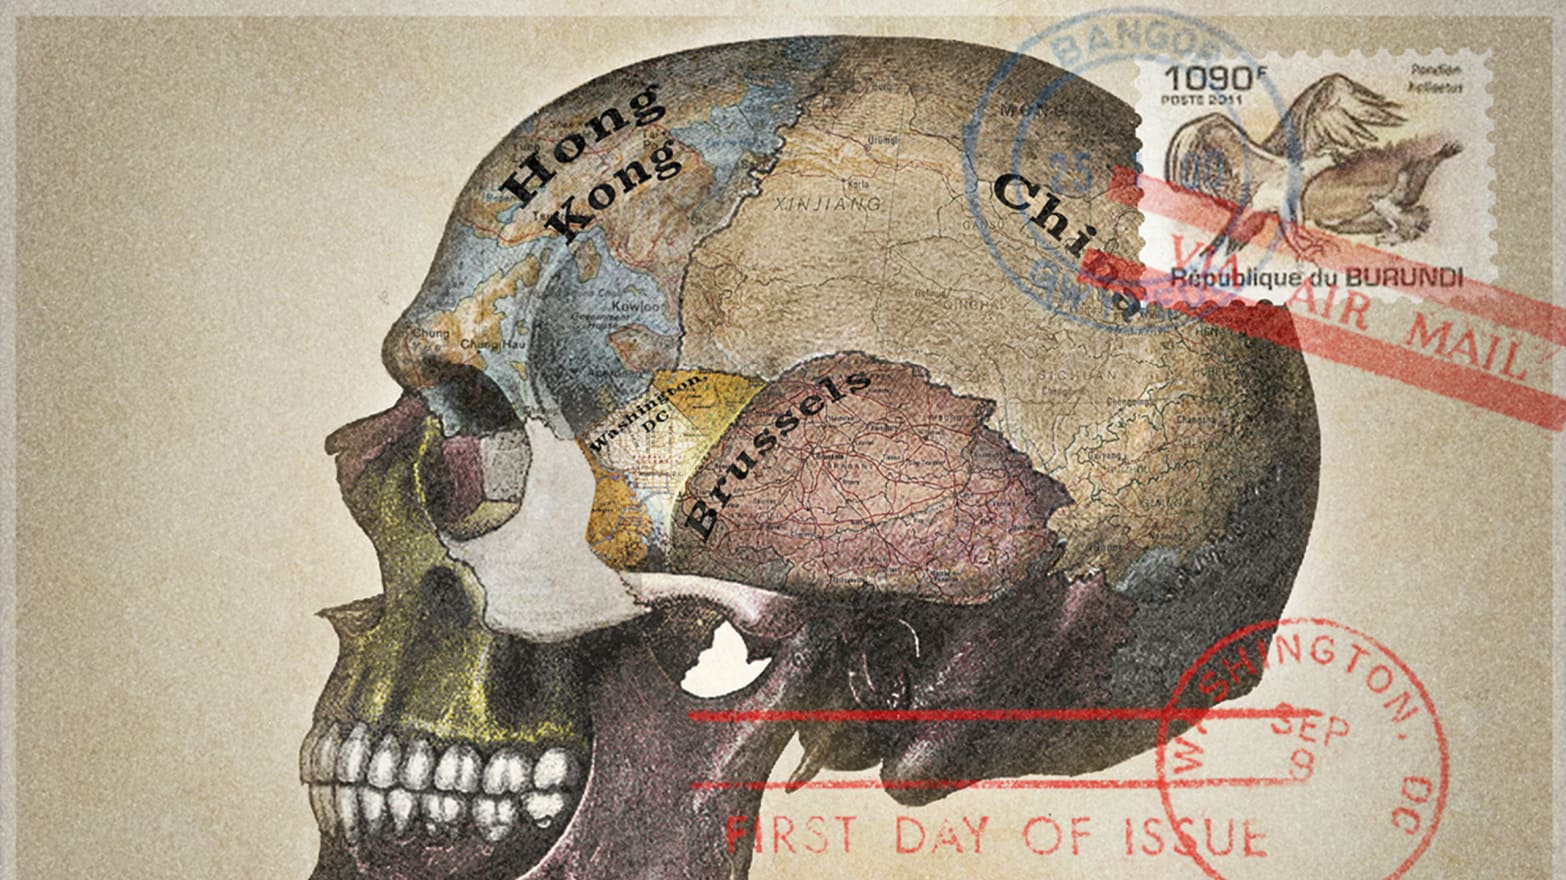 Burundi's Black Market Skull Trade